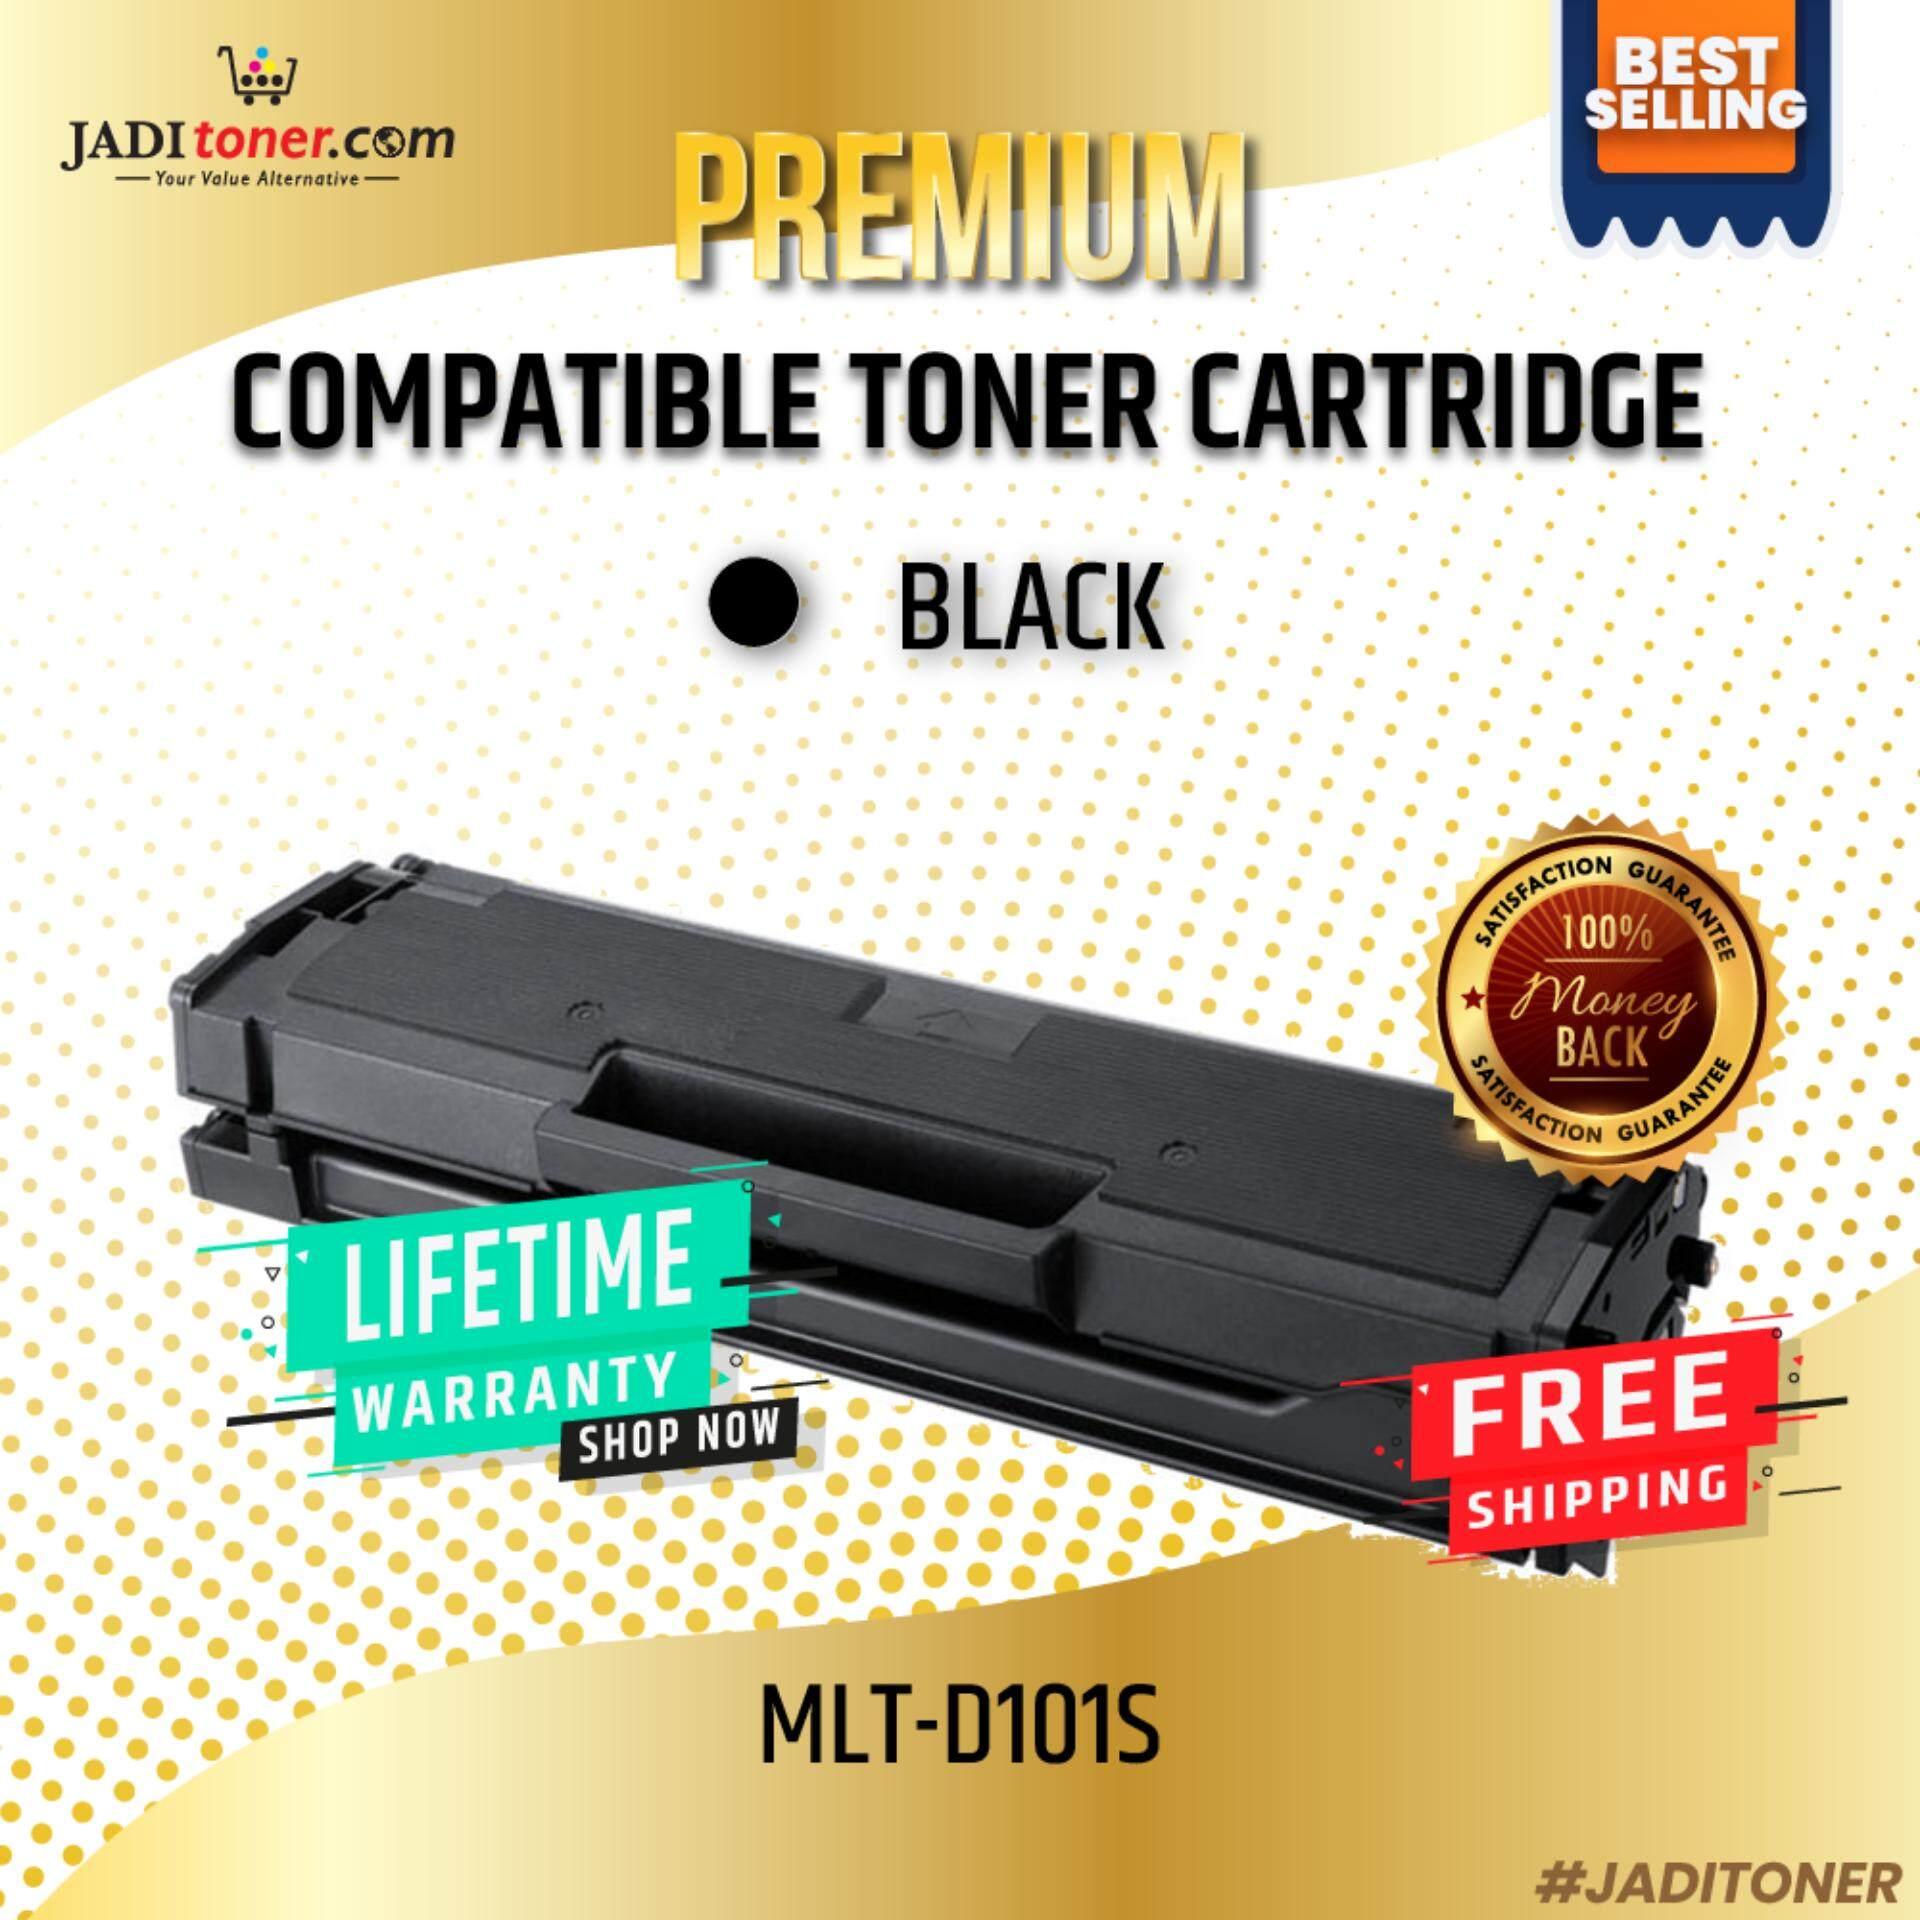 Compatible MLT-D101S Laser Toner Cartridge For Samsung MLTD101S MLT-D101 D101S 101S Samsung ML2160 ML2162 ML2165 ML2167 ML2168 SCX3400 SCX3405 SCX3407 SF760 SF765 2160 2162 2165 2167 2168 3400 3405 3407 760 765